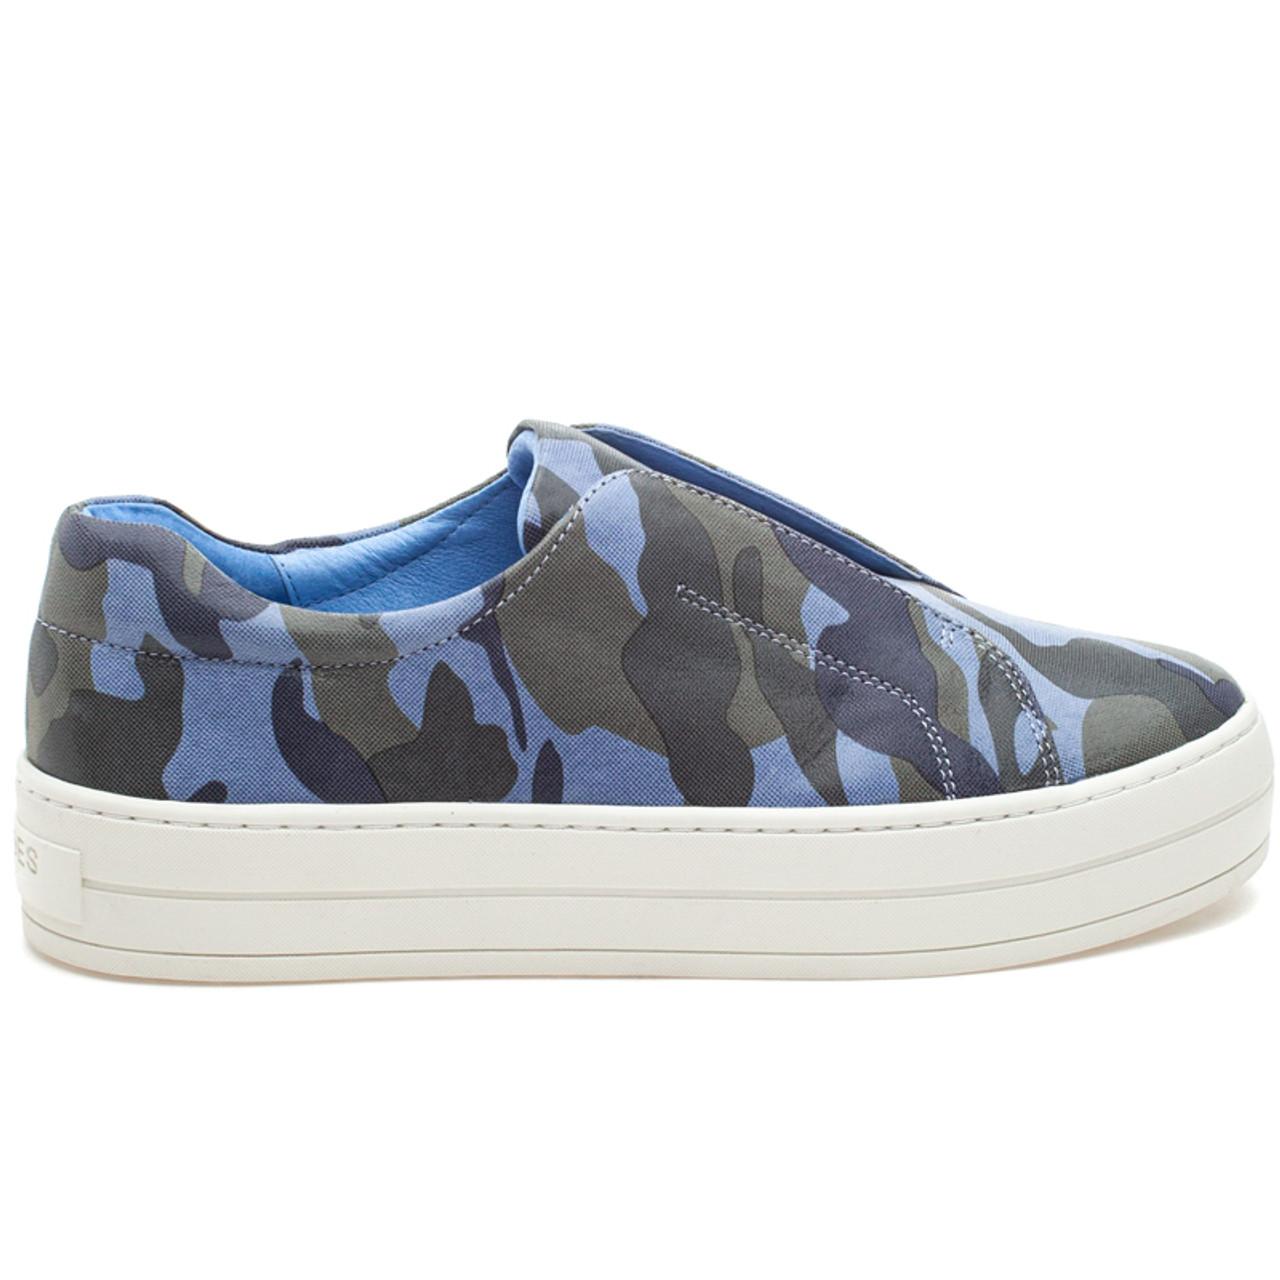 HEIDI Blue Camo Leather - JSlides